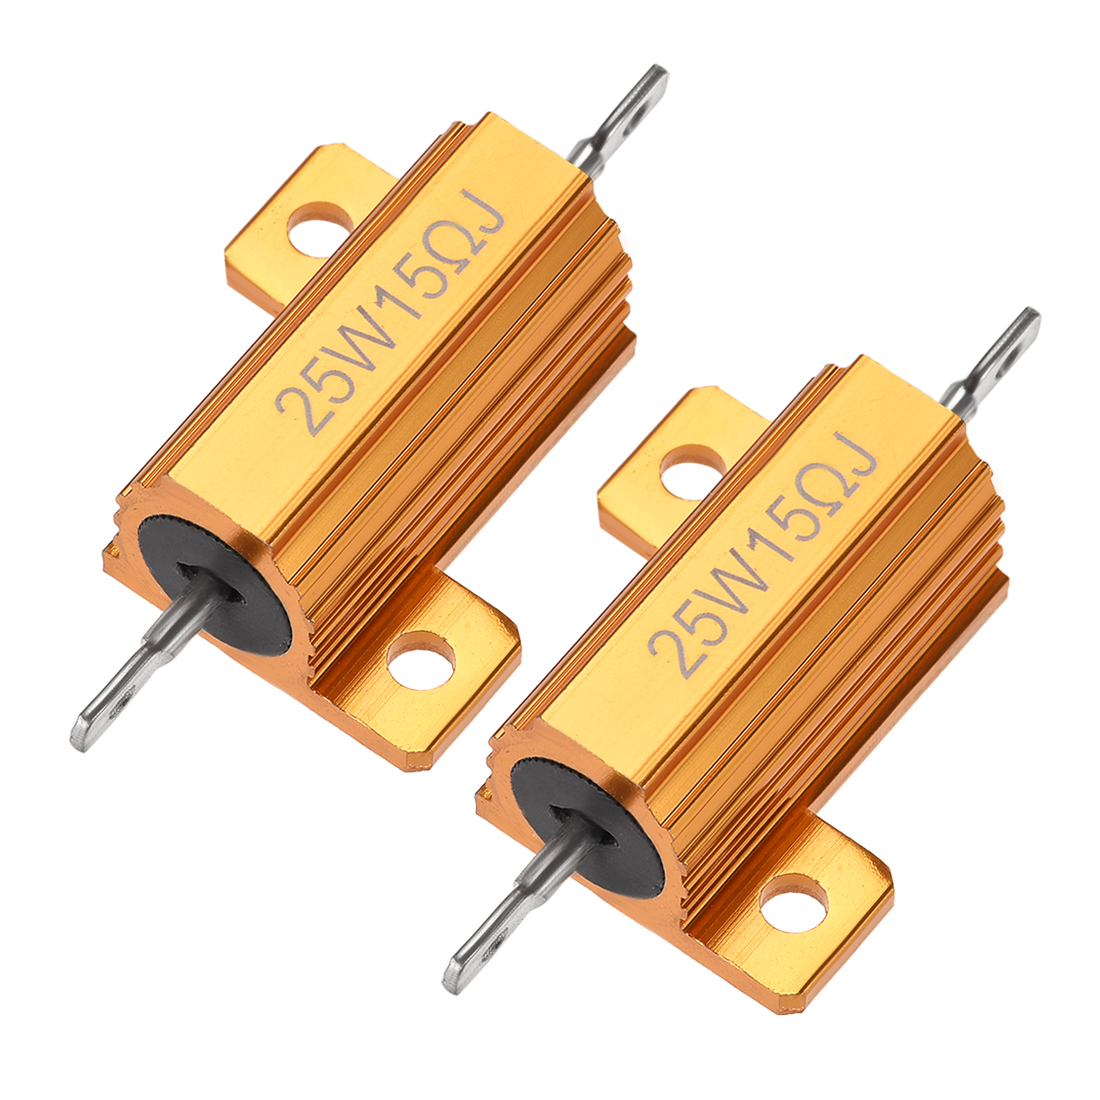 25Watt 15 Ohm 5% Aluminum Housing Resistor Wirewound Resistor Gold Tone 2 Pcs